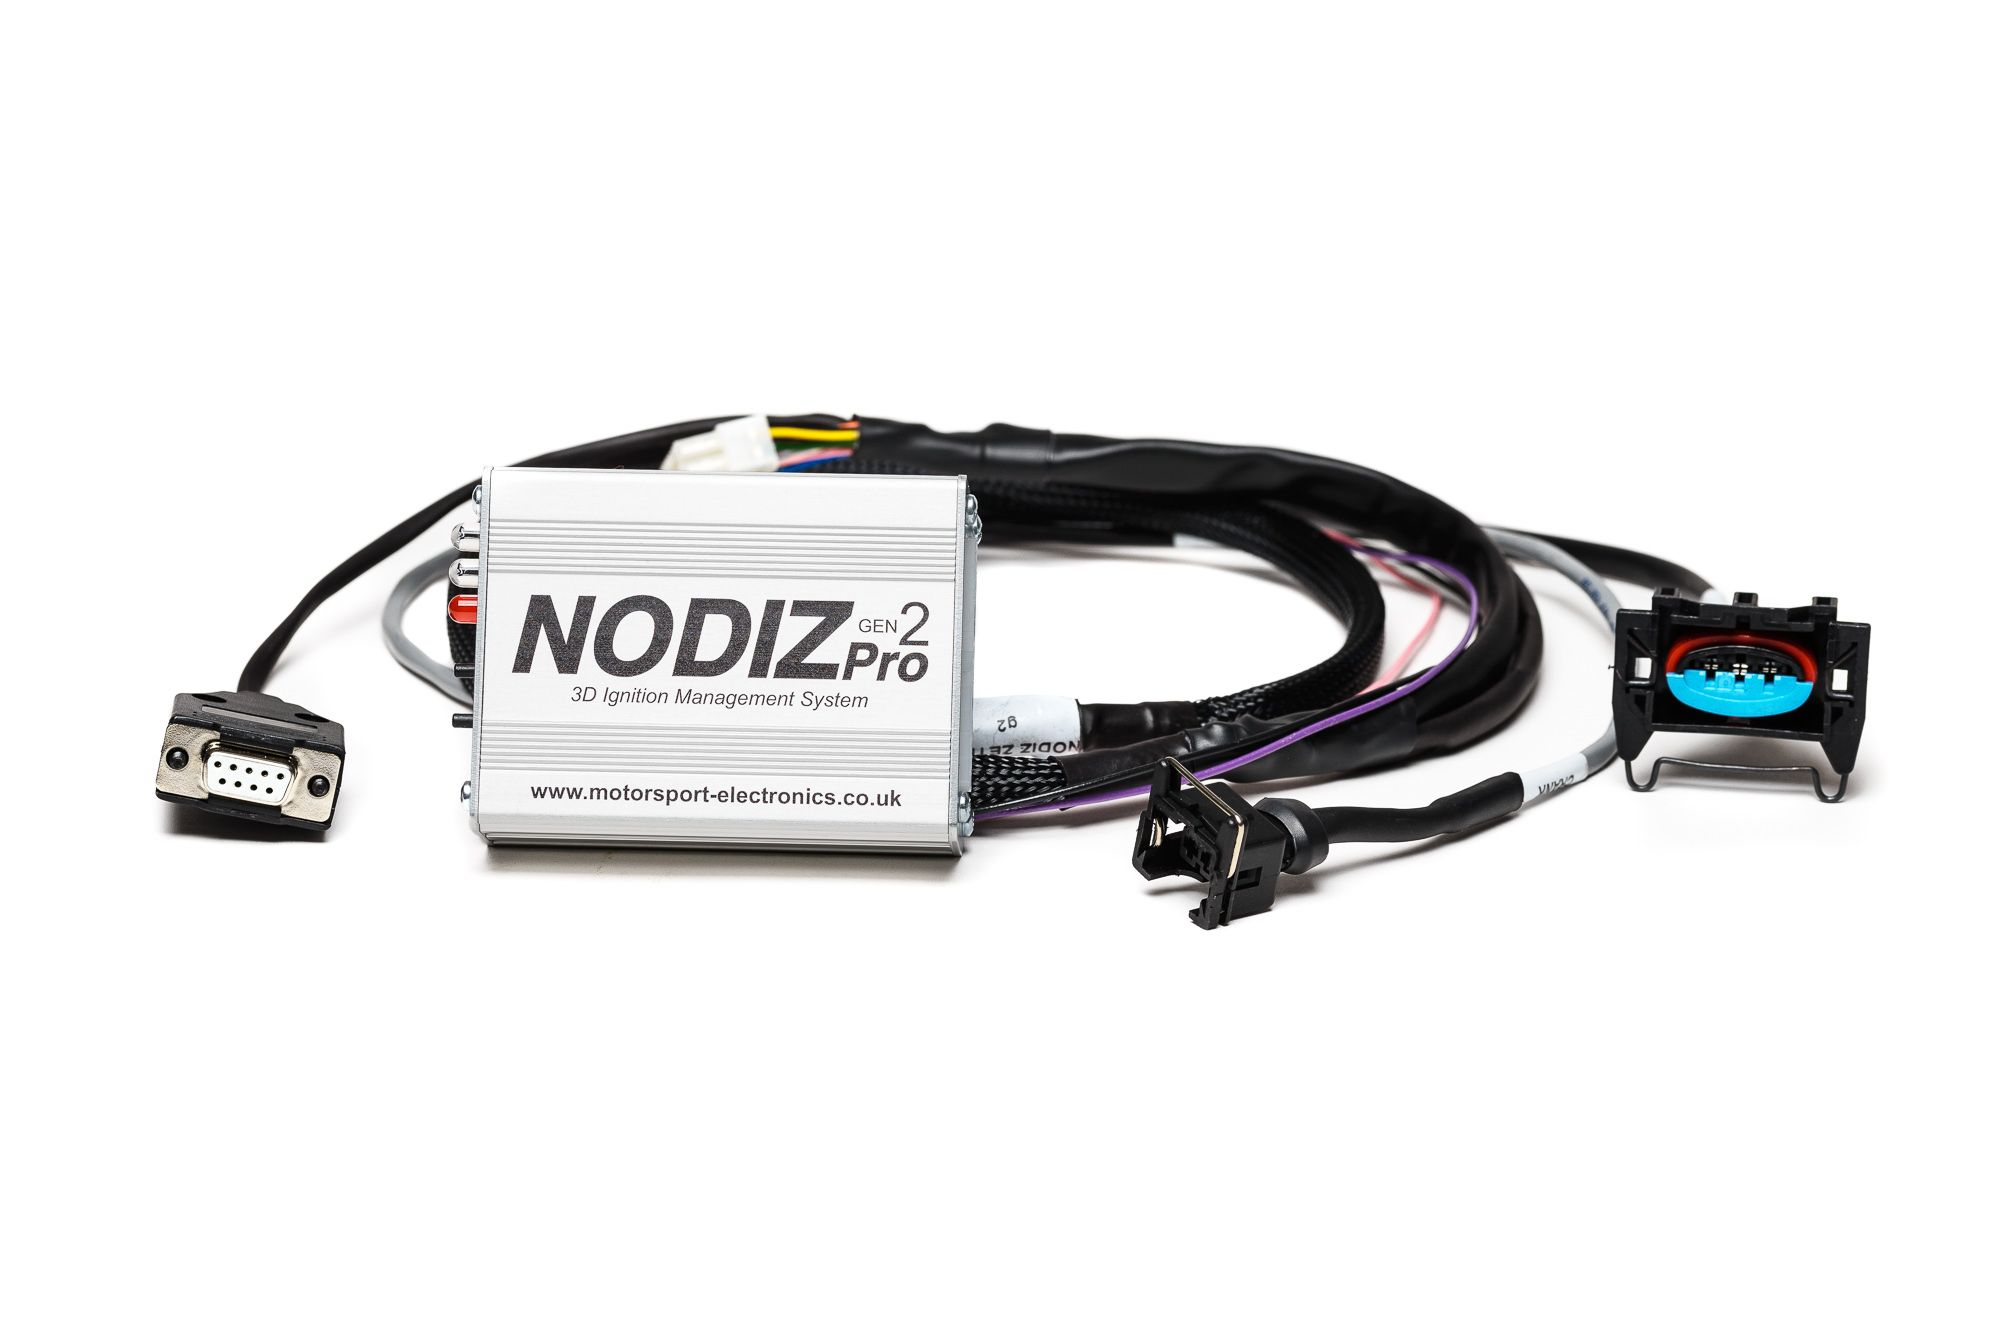 Nodiz Pro With Ford Zetec Duratec Loom Digital Dashboard